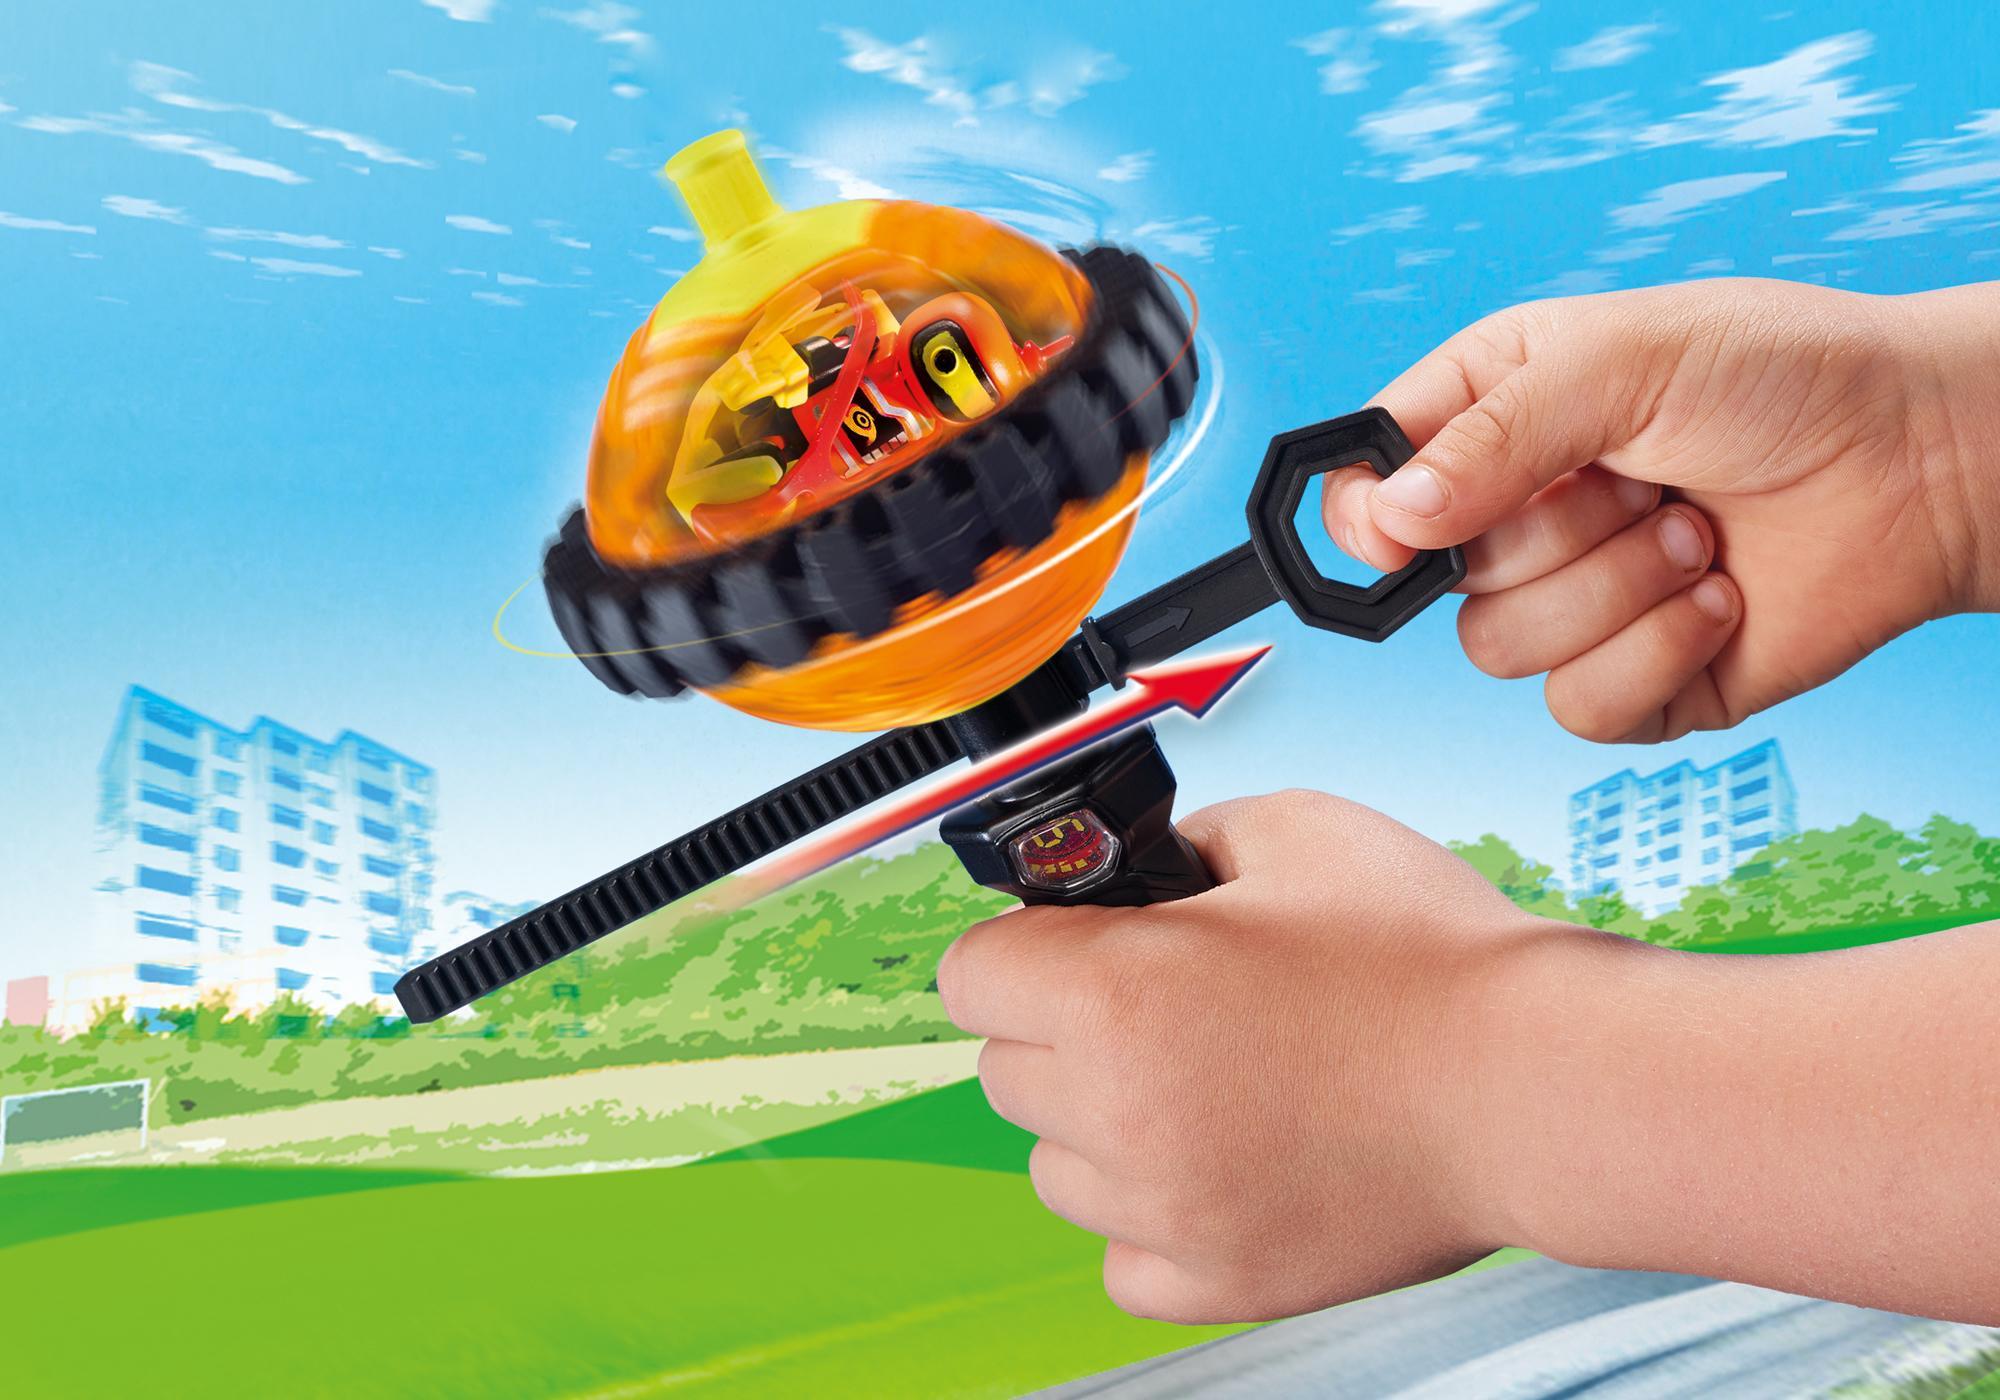 http://media.playmobil.com/i/playmobil/9203_product_extra2/Speed Roller arancio con robot